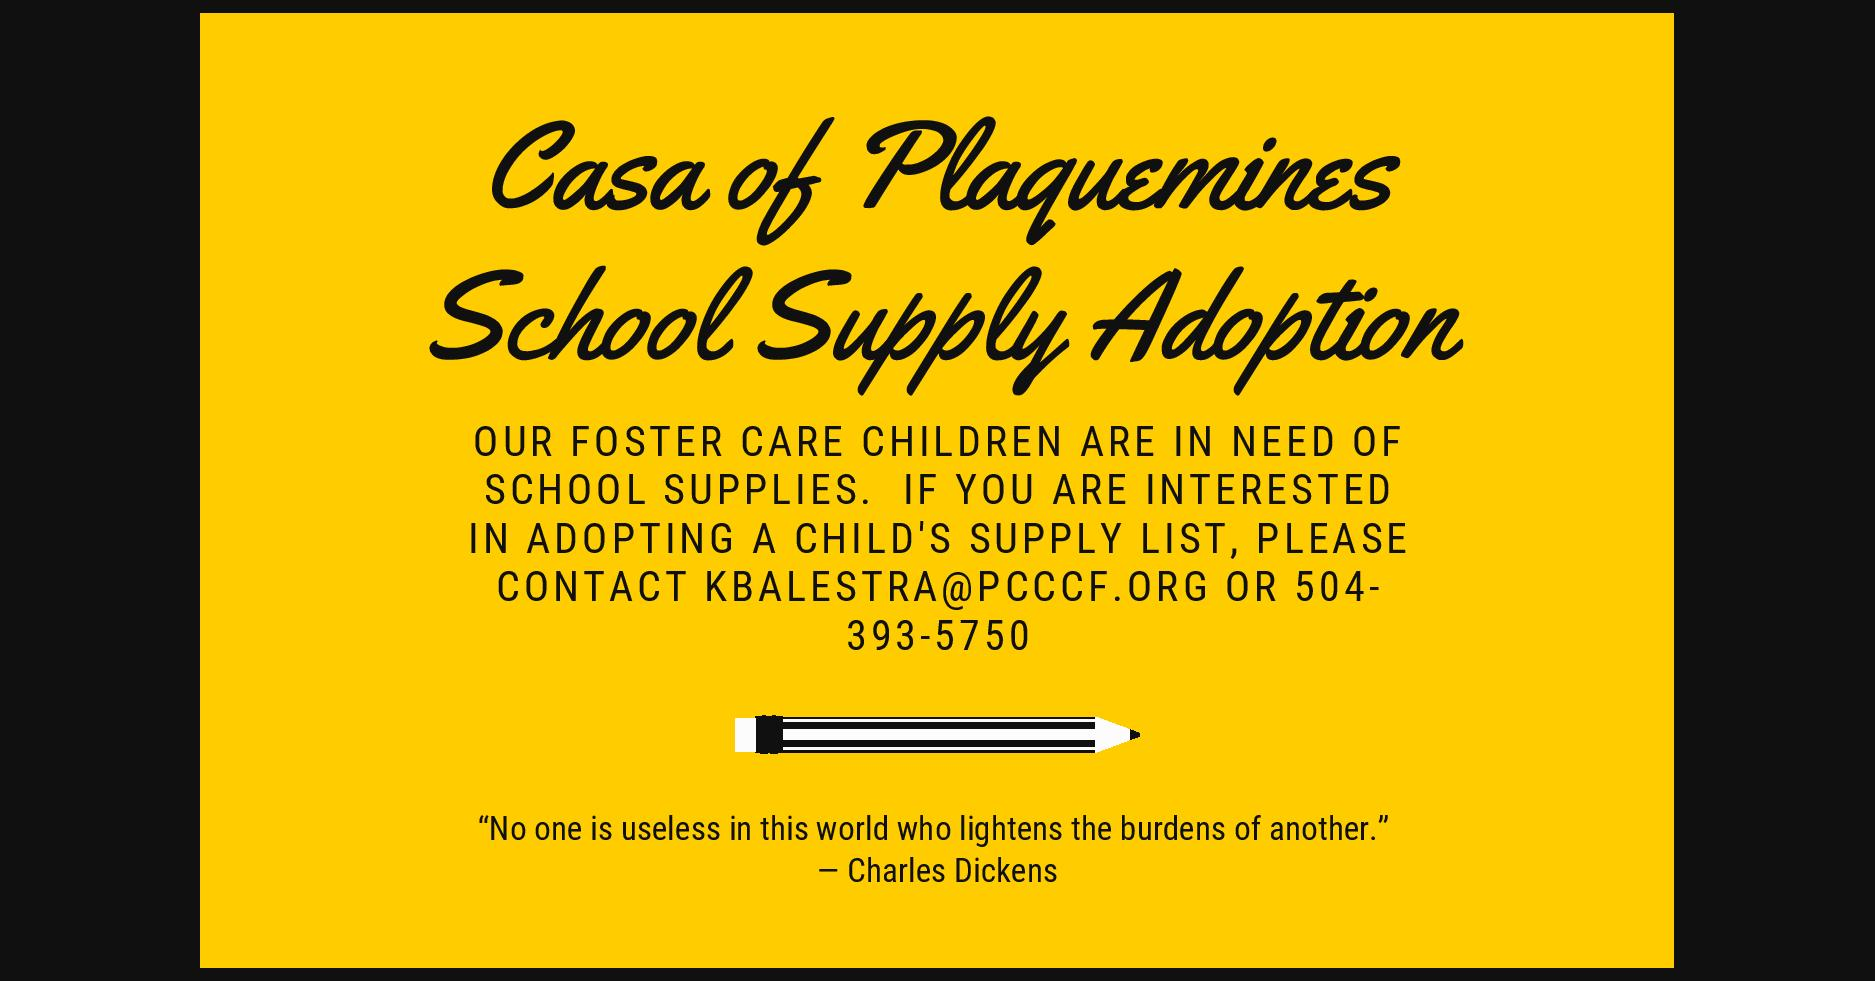 school supply adoption -page-001.jpg